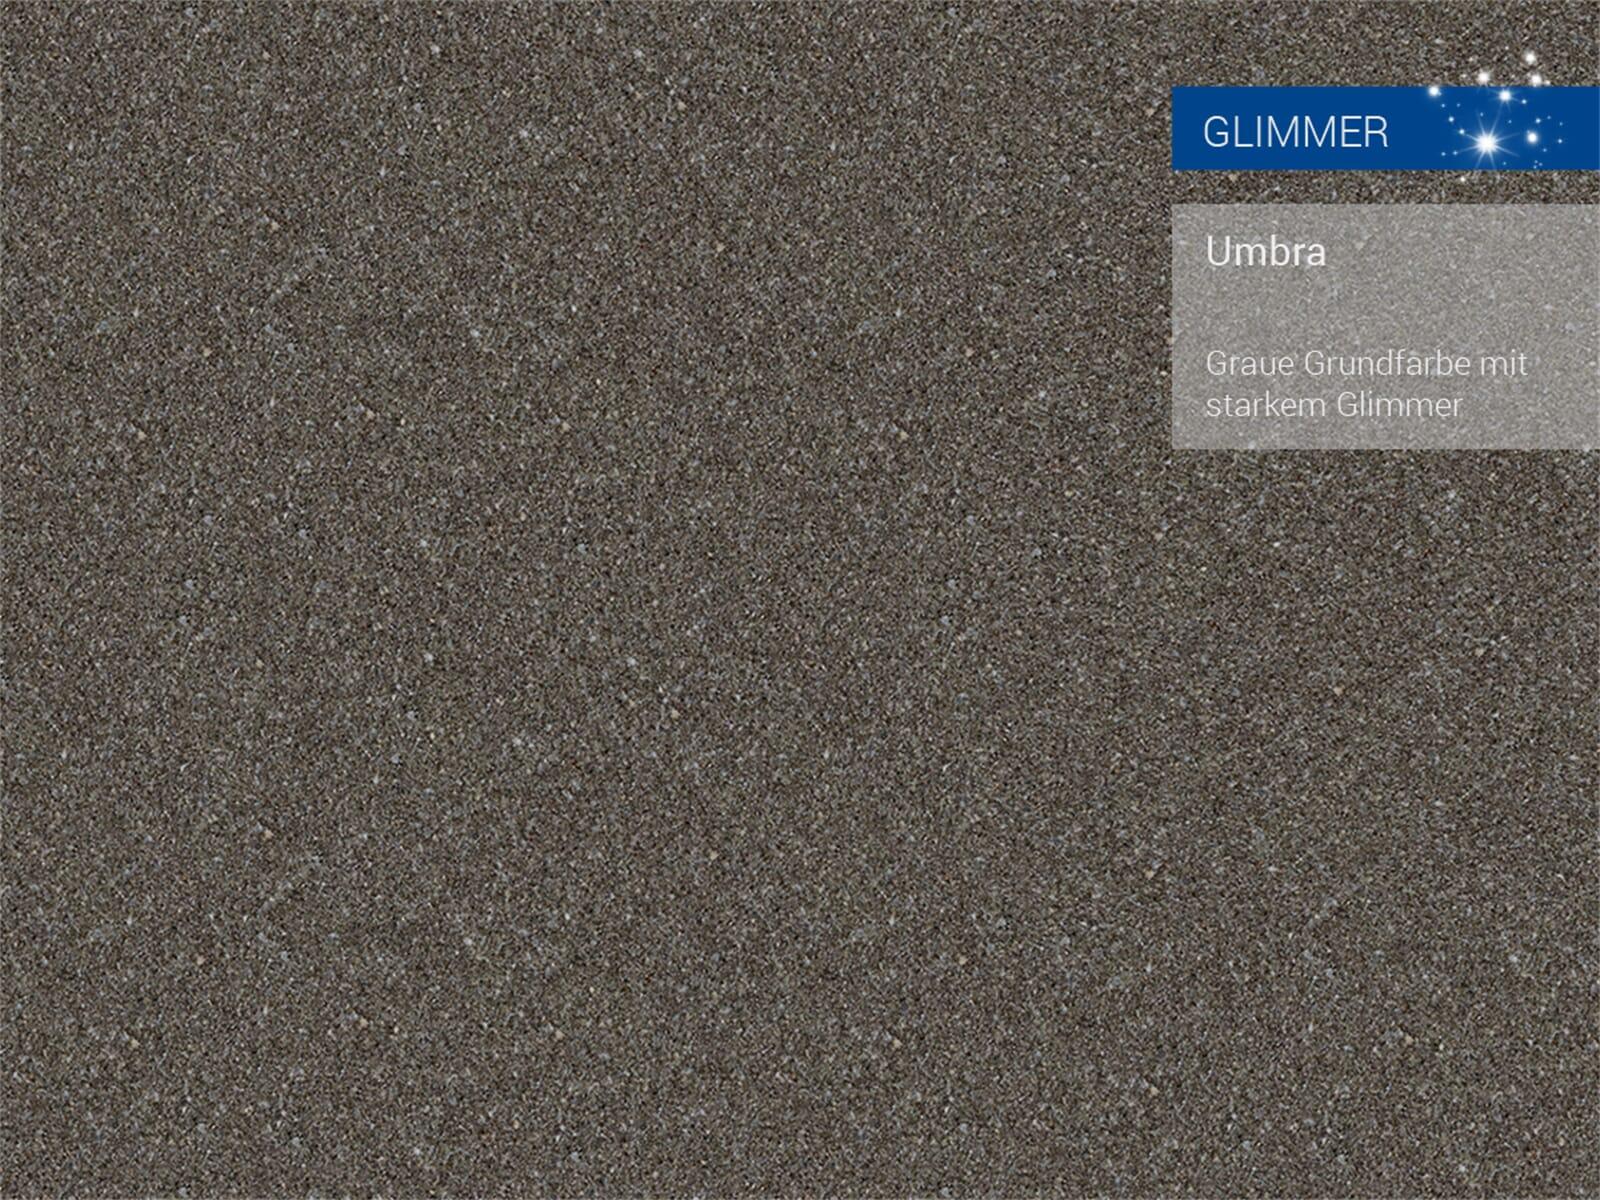 Franke Sinta Chrom-Umbra - 11196 Niederdruckarmatur